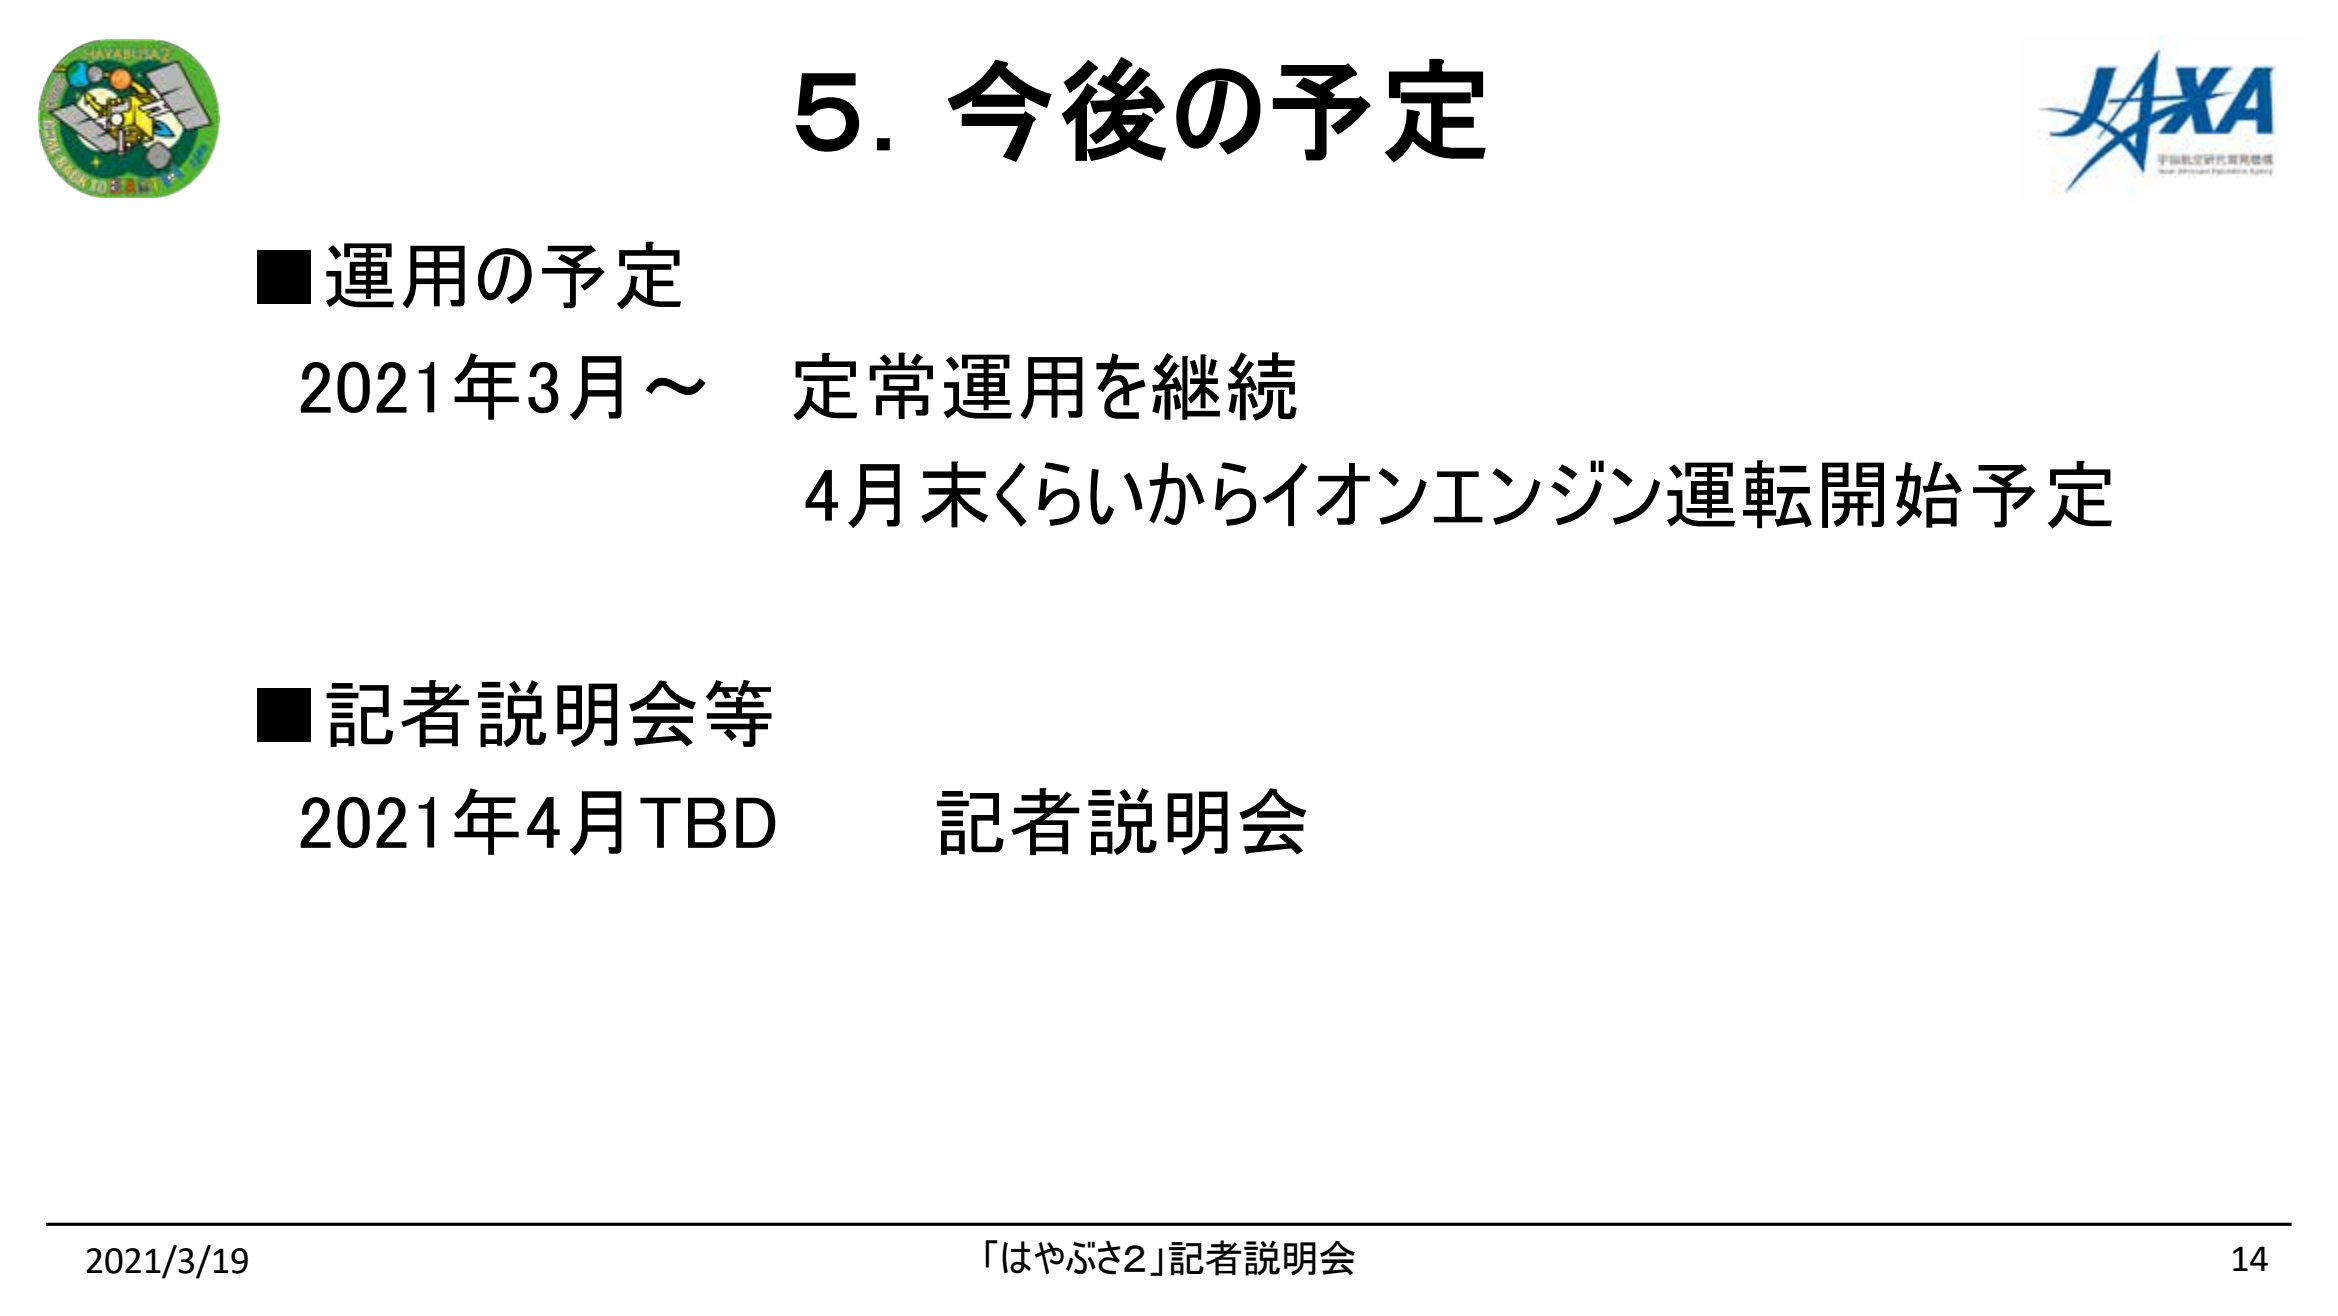 f:id:Imamura:20210319144526p:image